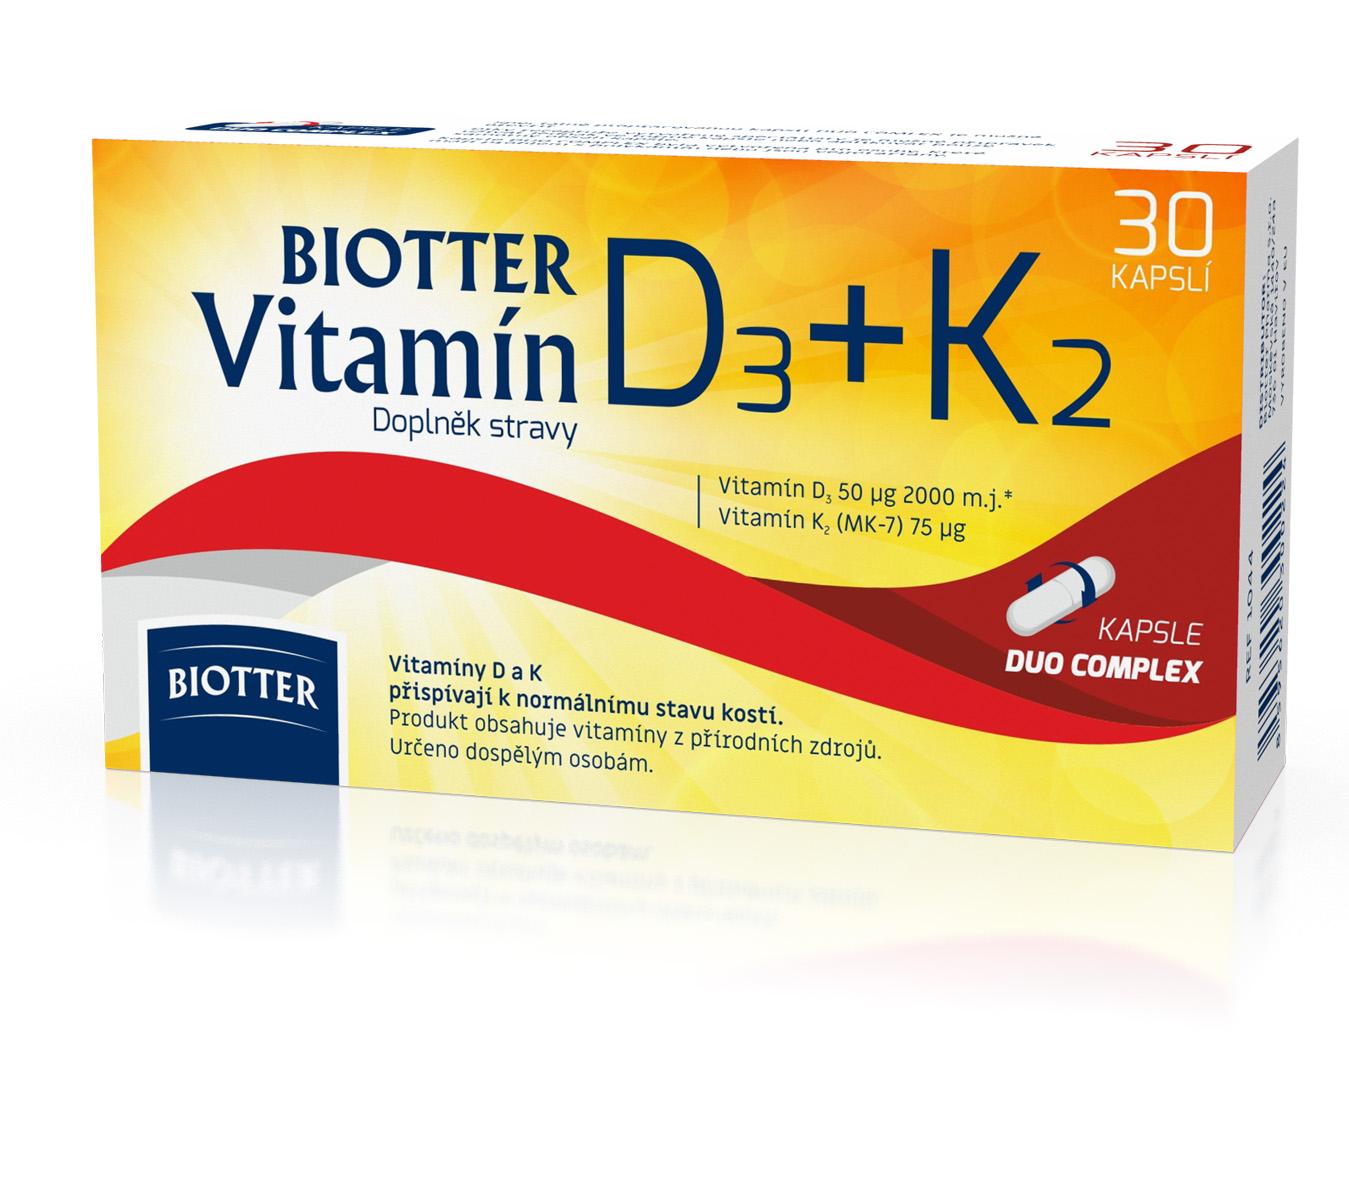 Biotter Vitamín D3+K2 doplněk stravy 30cps.